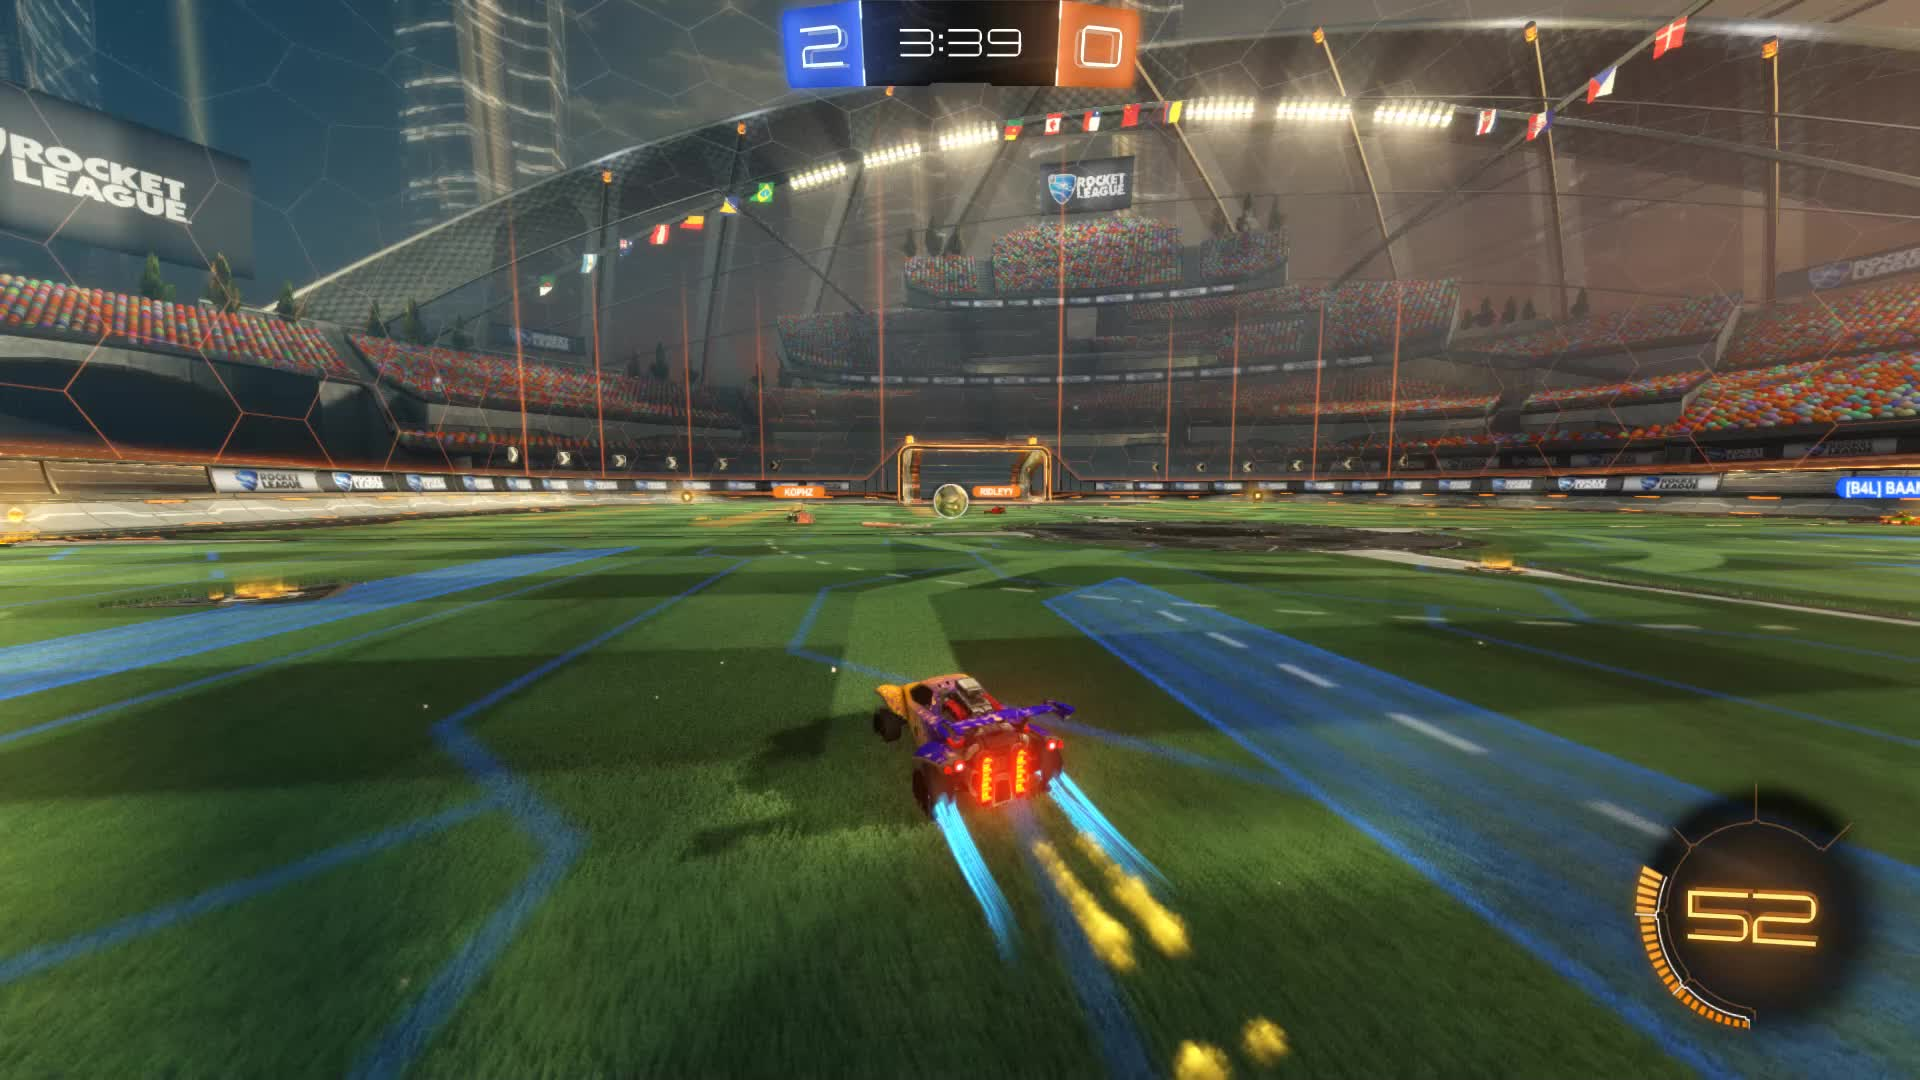 Gif Your Game, GifYourGame, Goal, Rocket League, RocketLeague, Squash, Goal 3: Squash GIFs